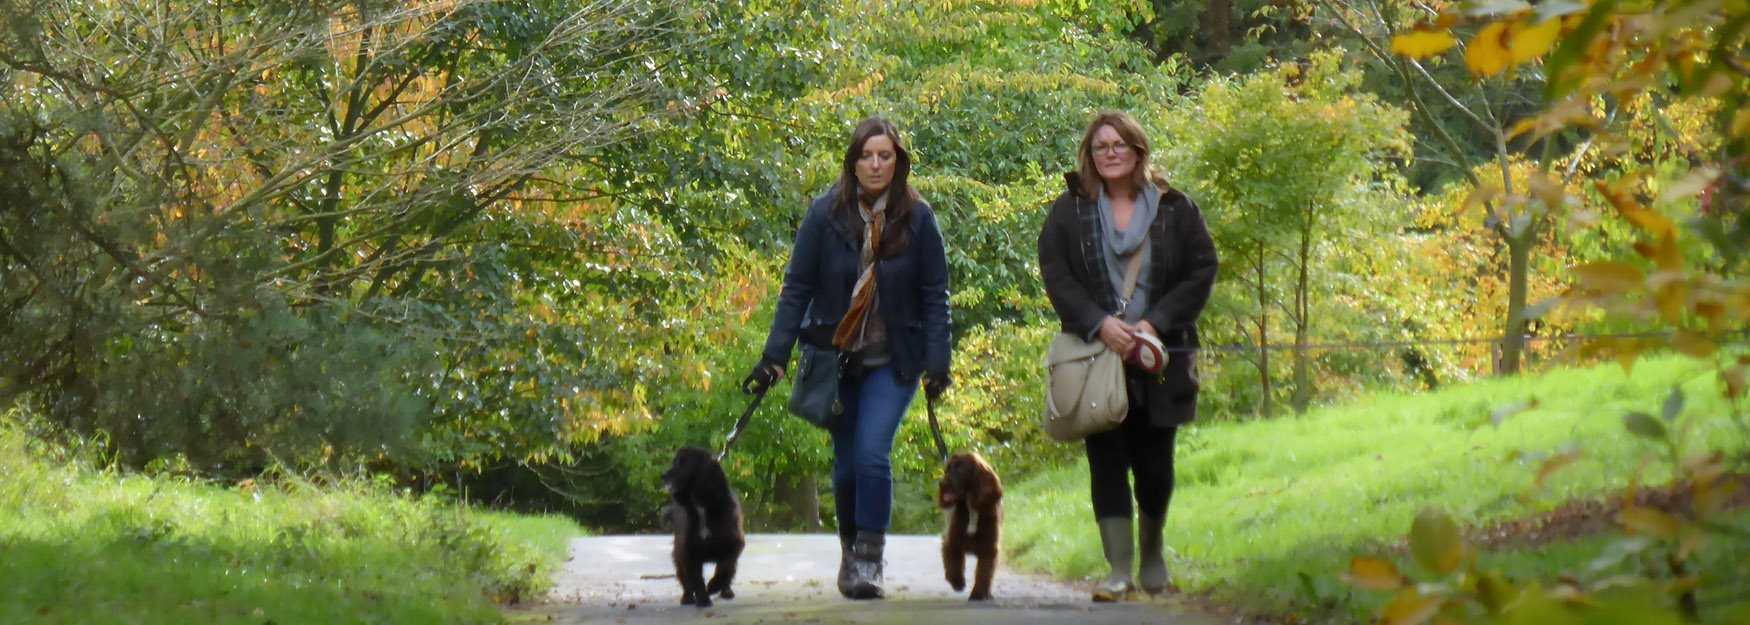 Autumn dog walkers at Batsford Arboretum